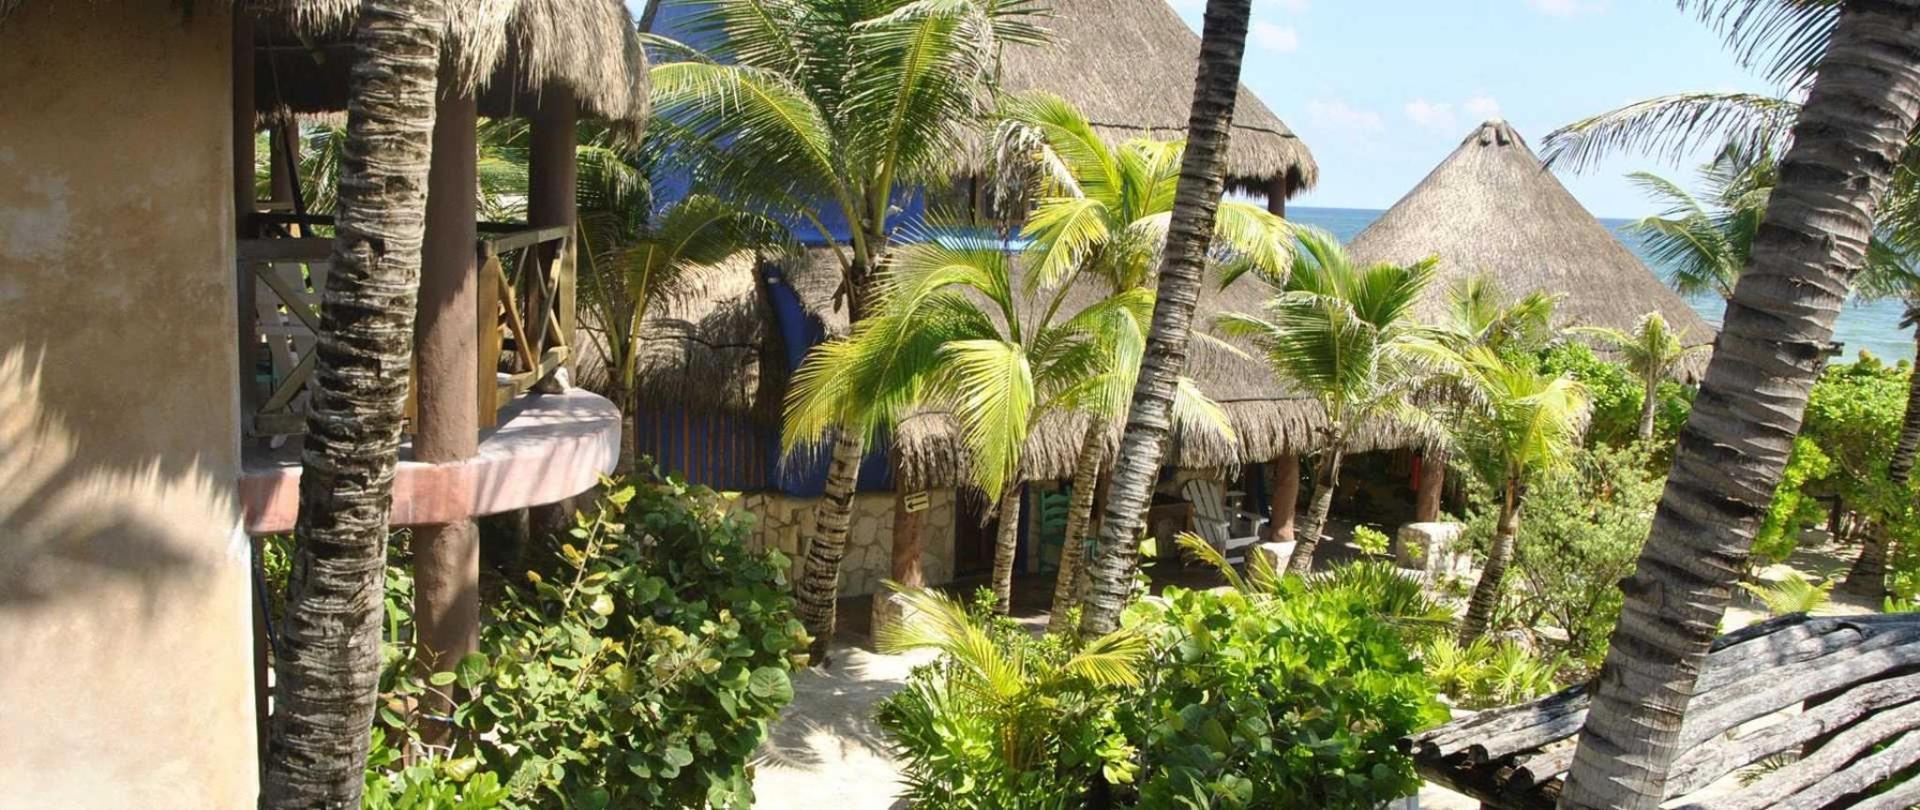 homepage hotel calaluna tulum tulum mexico hotel. Black Bedroom Furniture Sets. Home Design Ideas